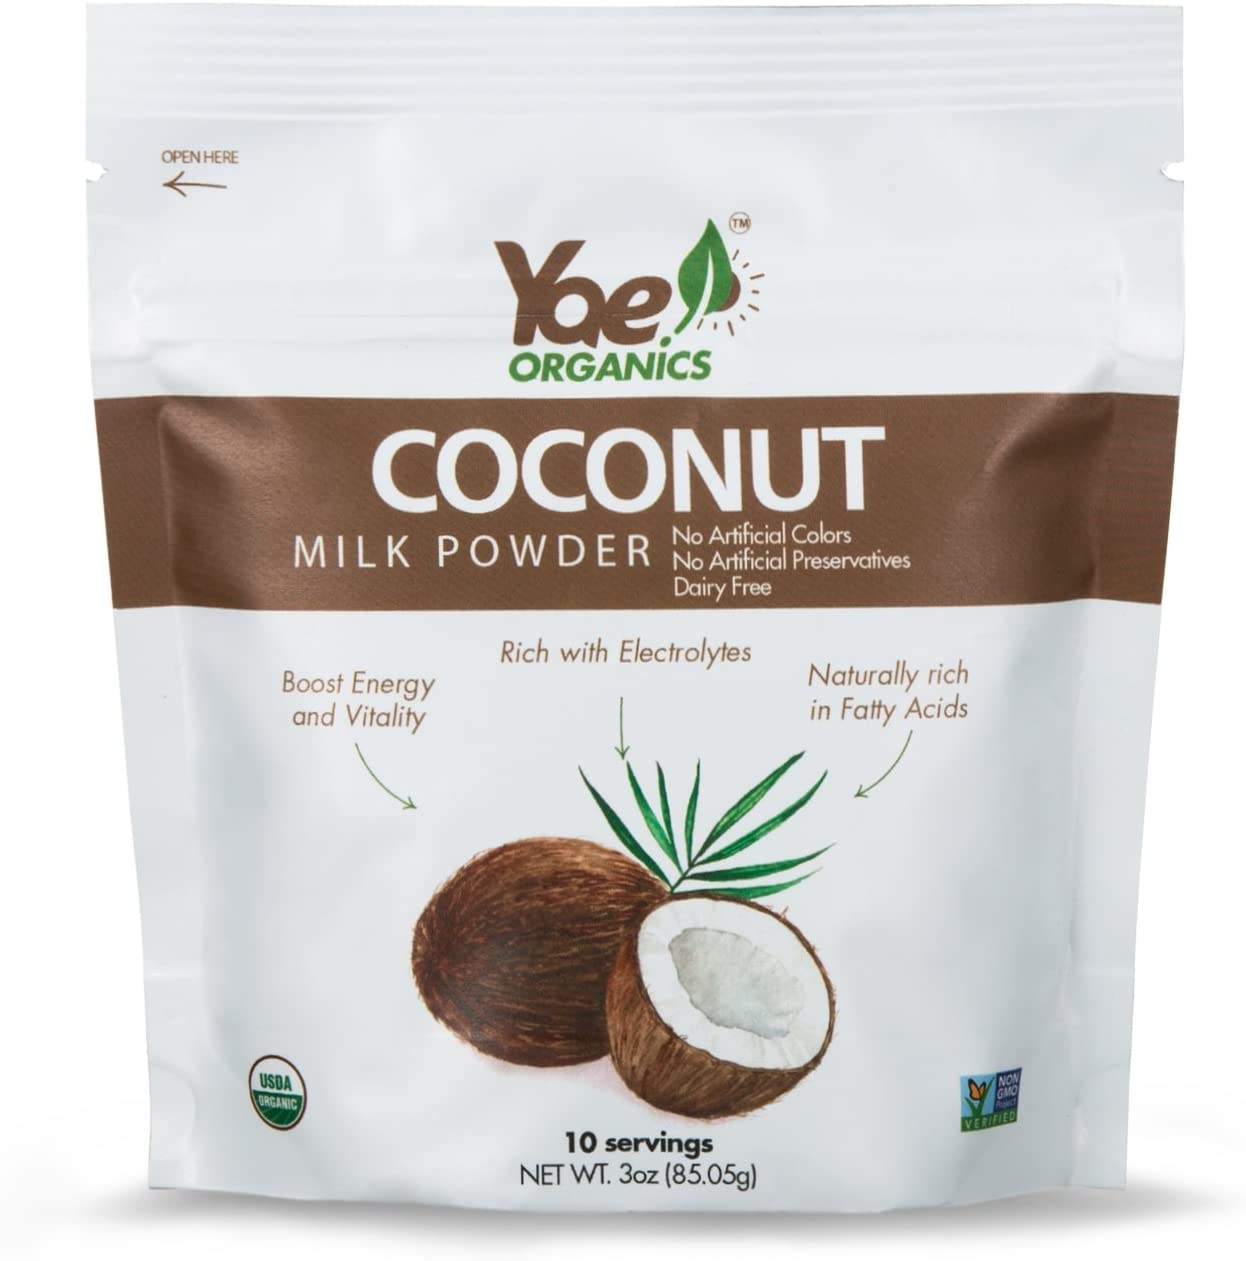 Yae! Organics 100% Organic Keto Coconut Milk Powder Non GMO Gluten Free, Vegan, Dairy Free Powdered Coconut Milk (3oz/10 Servings)